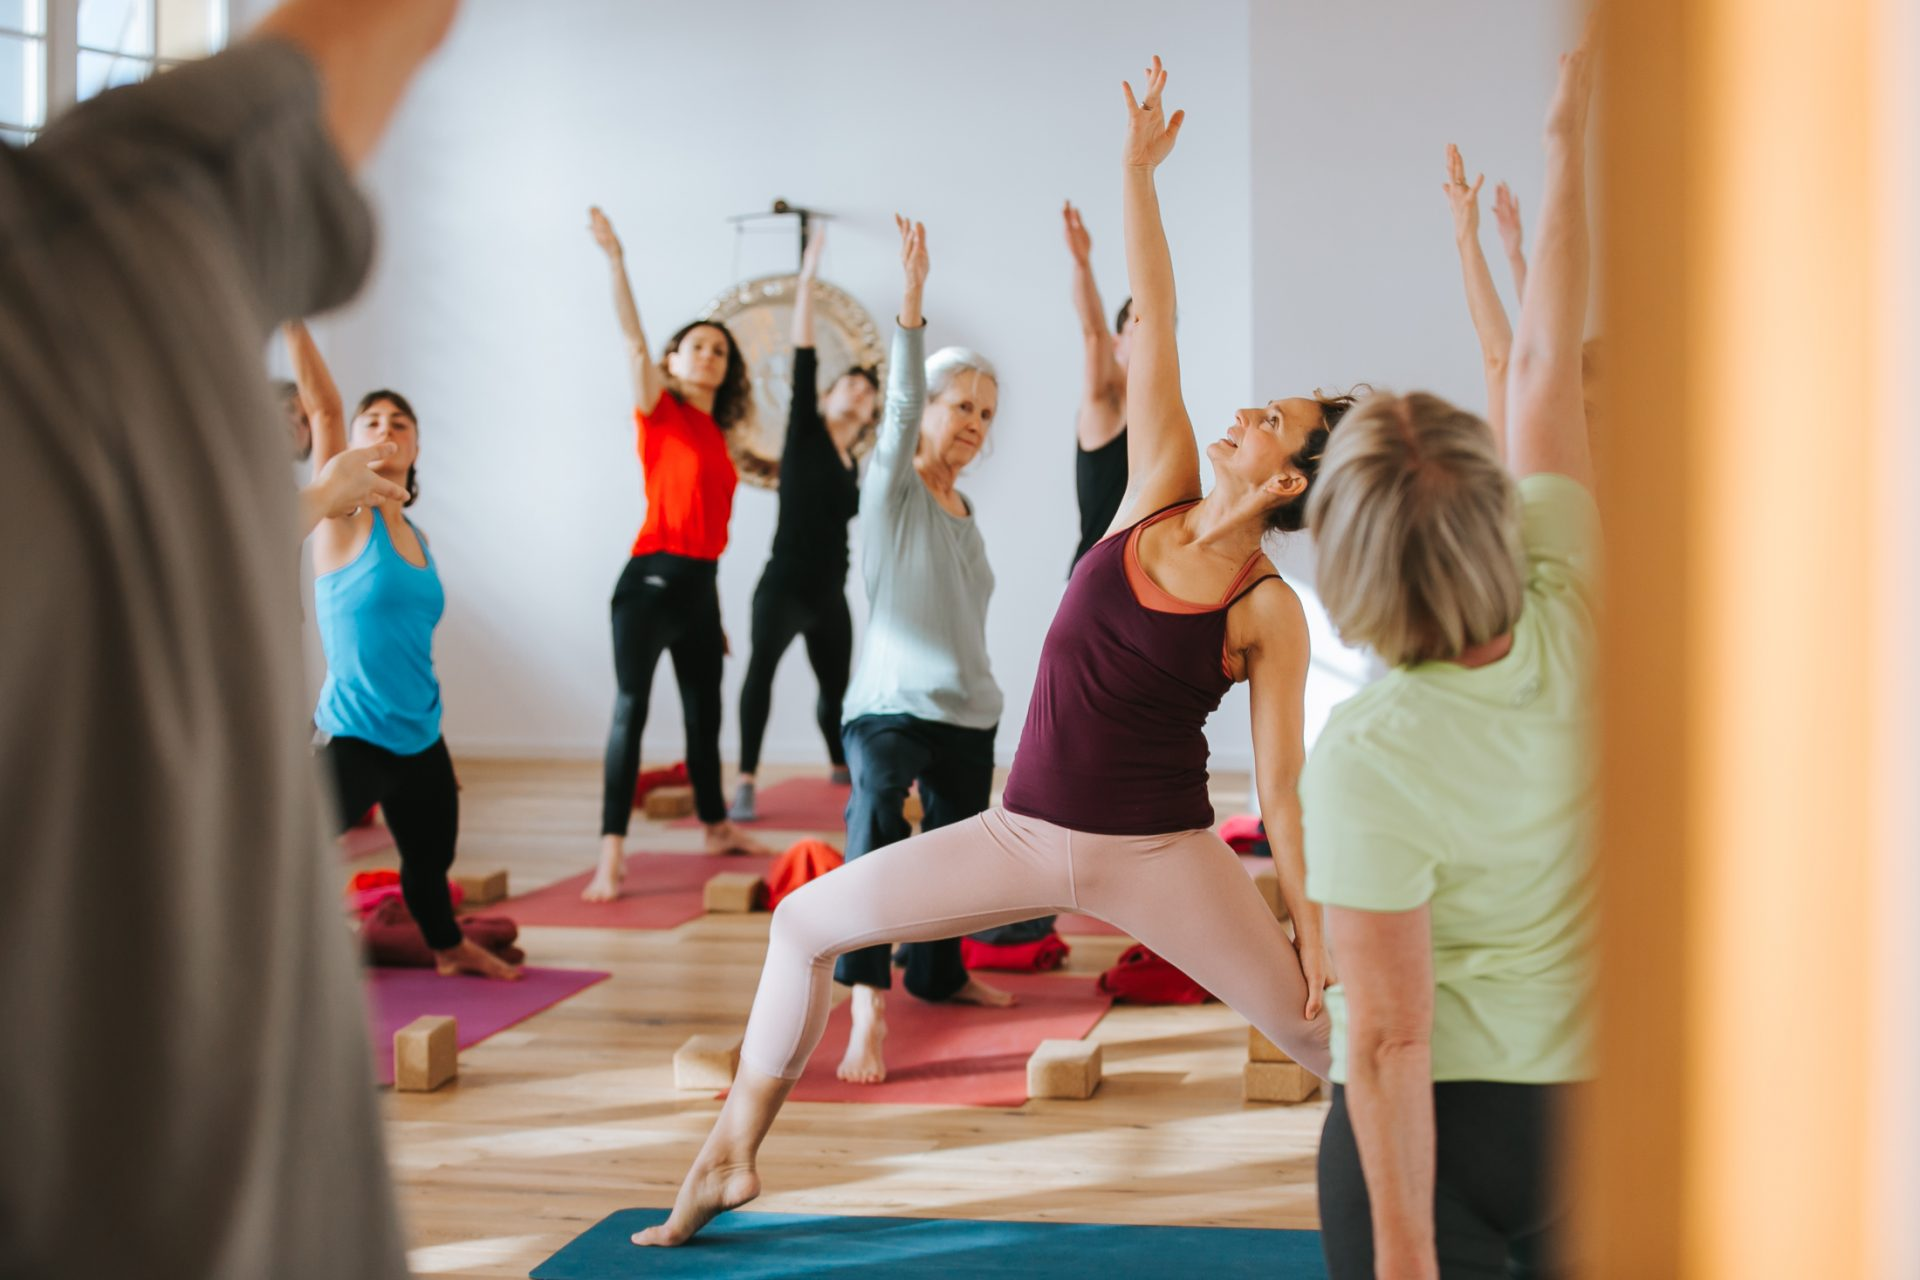 Yogastudio-yoga-ma-in-Stuttgart-Vaihingen-und-Umgebung-kleinYogaMaStudio2020-104